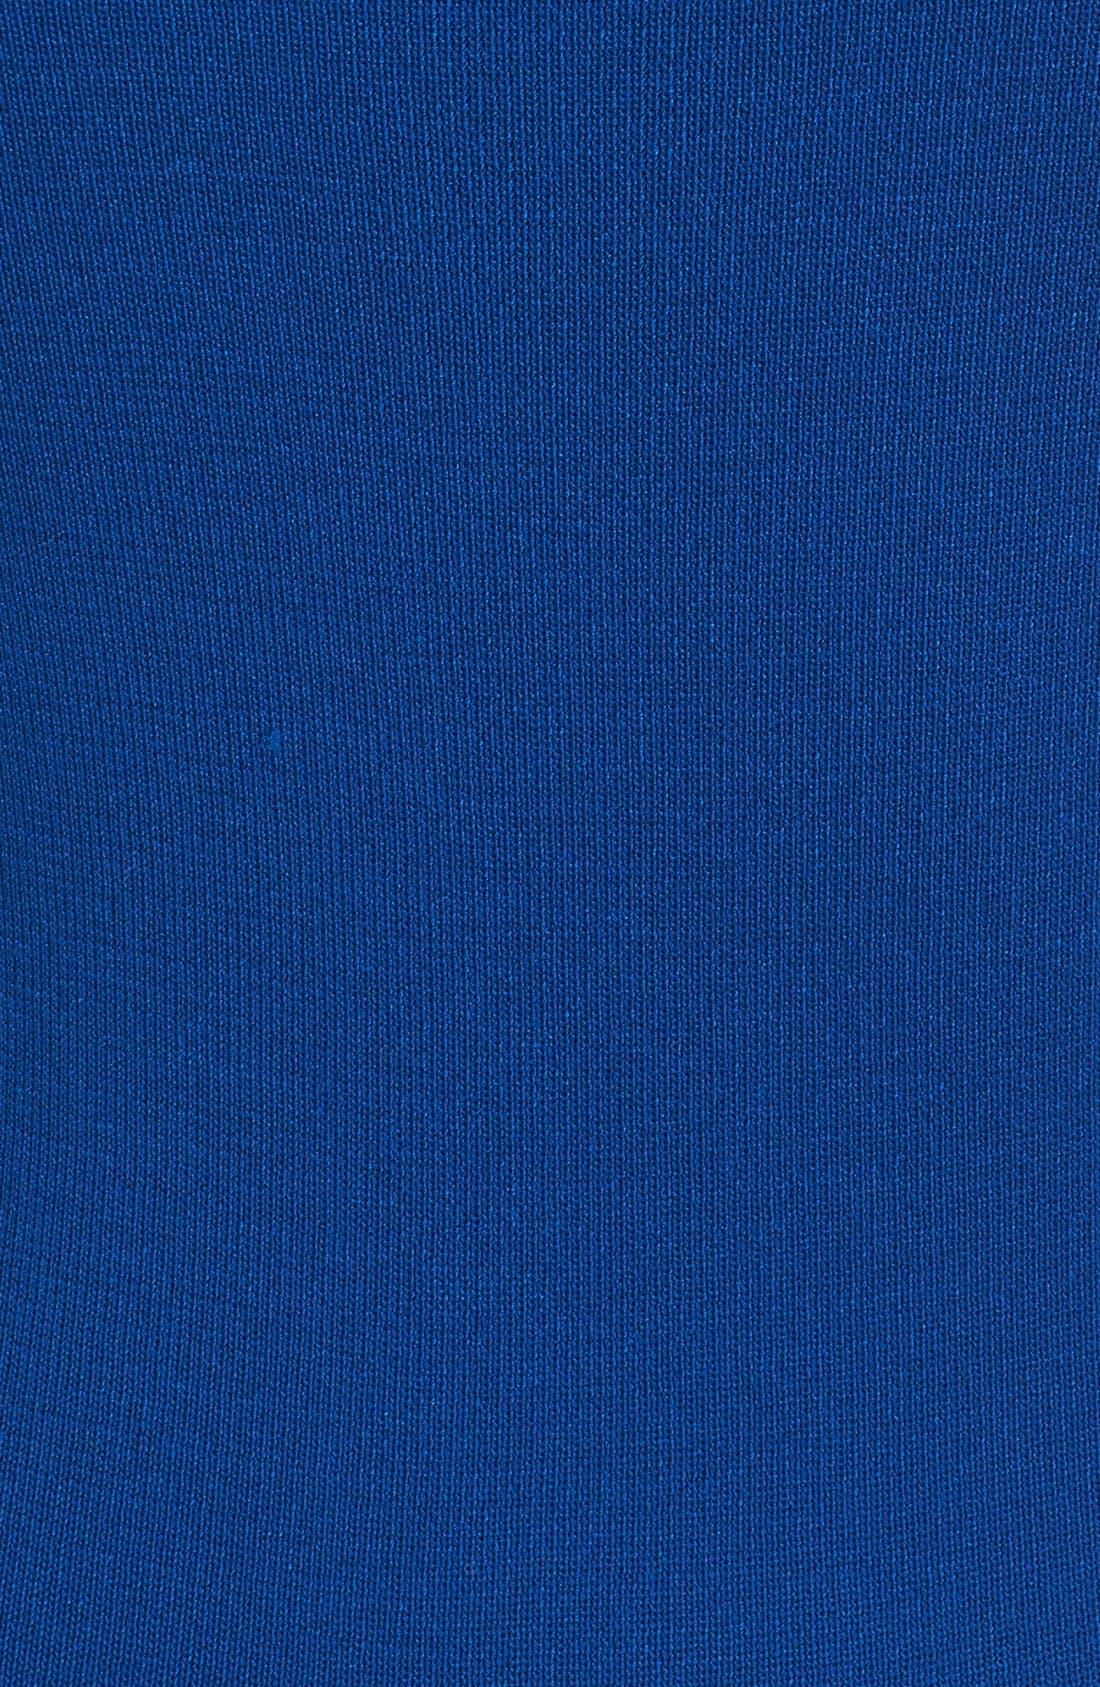 Alternate Image 5  - Carven Stretch Knit Fit & Flare Dress